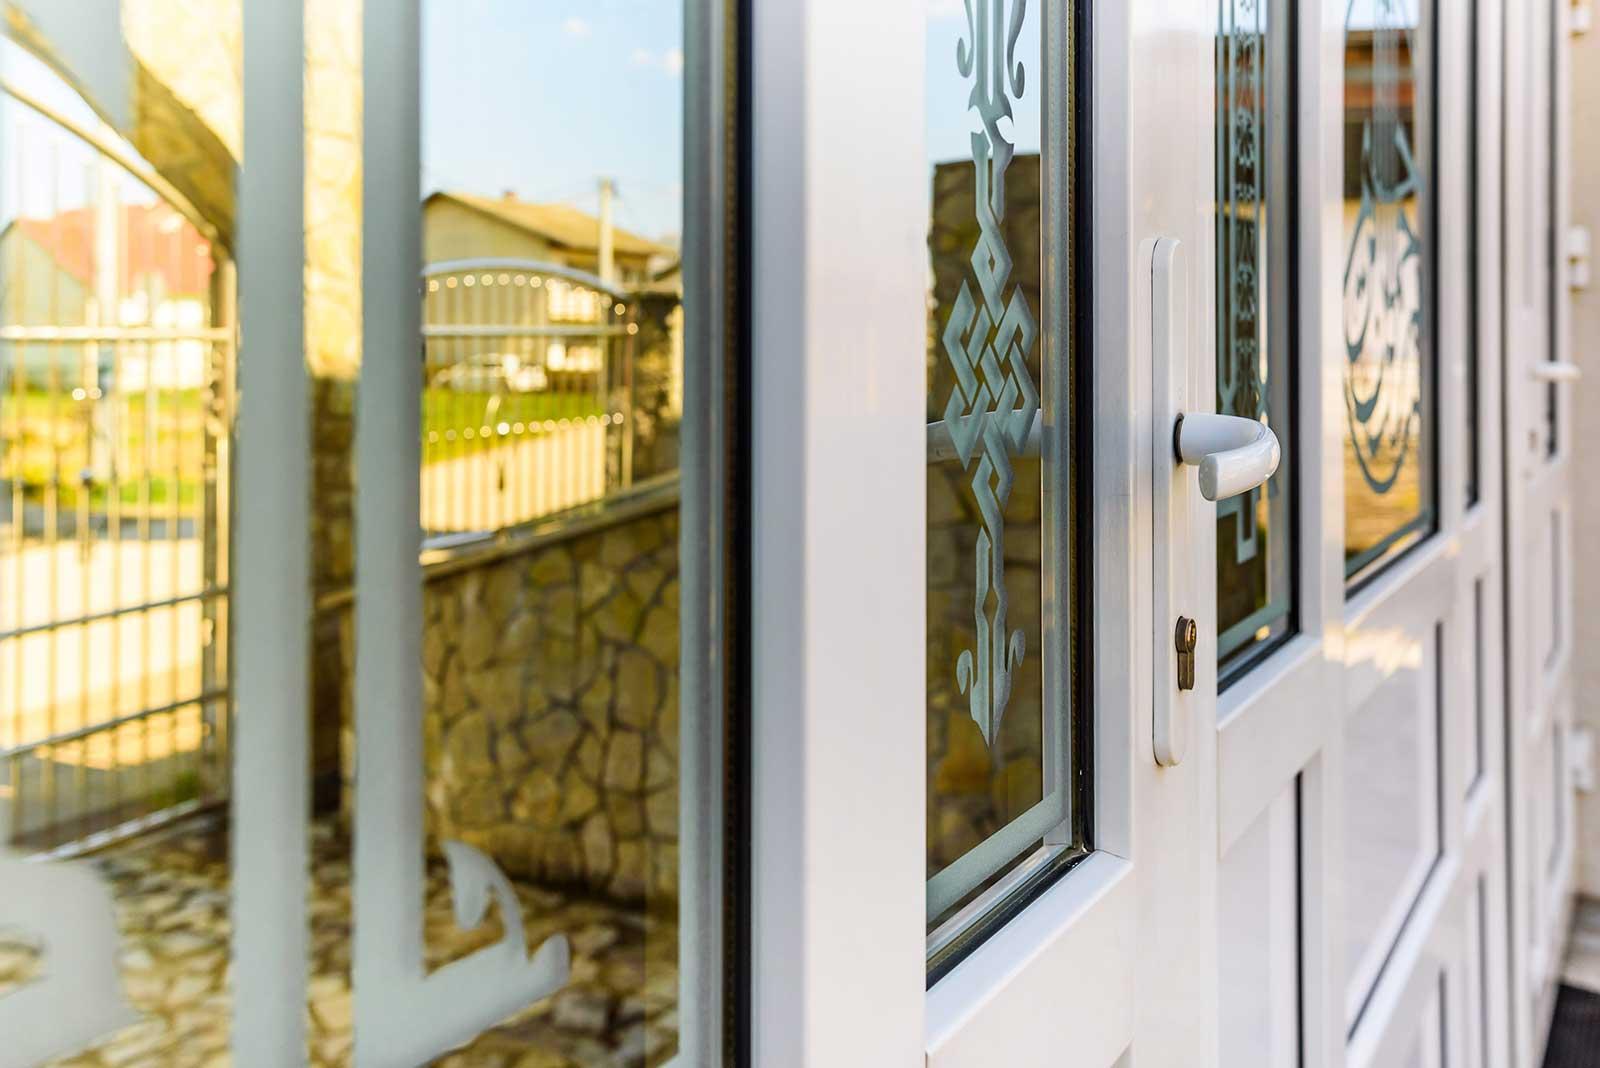 Double Glazing Showroom High Wycombe